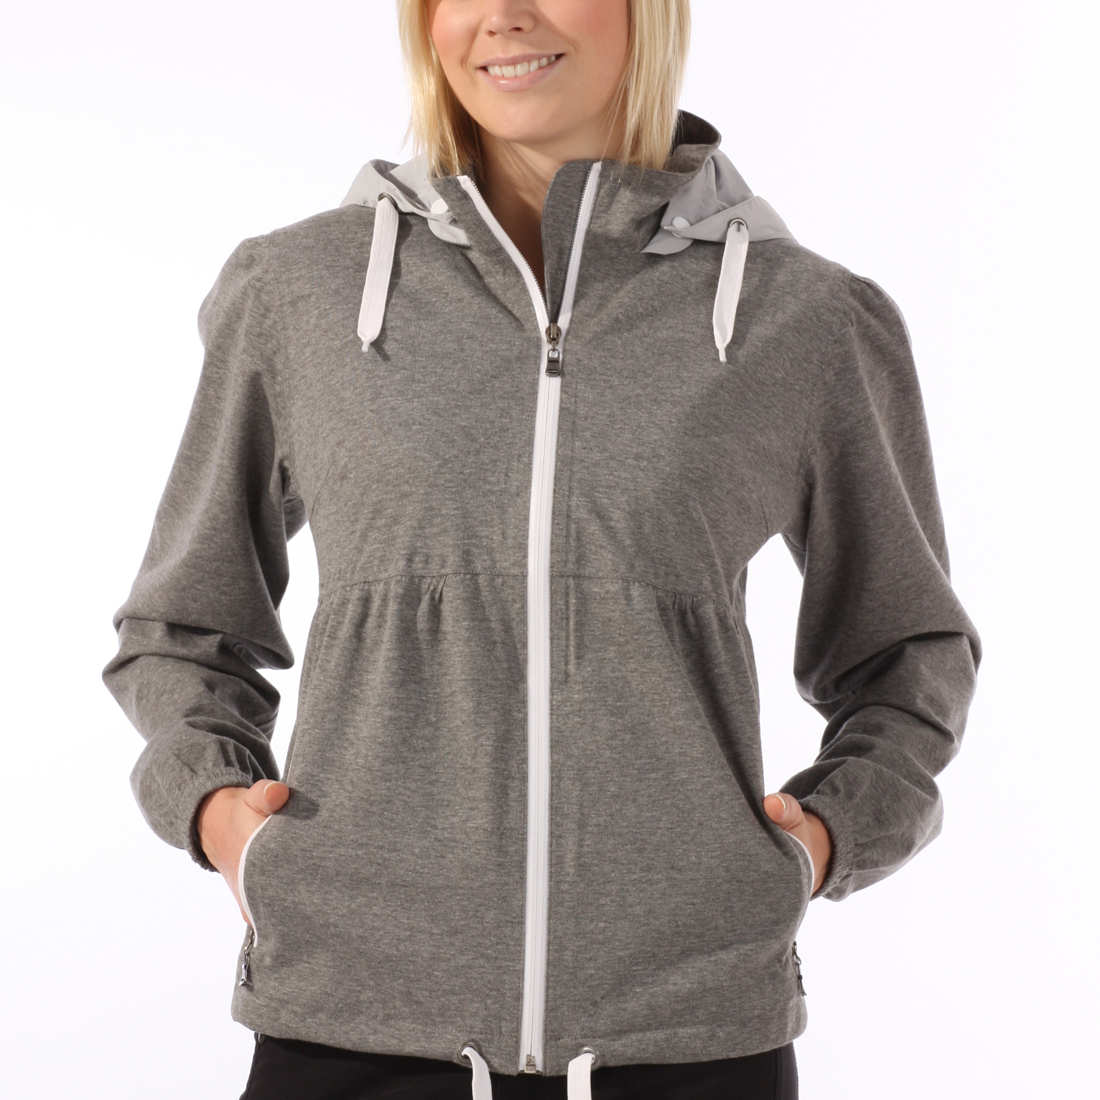 Rainproof Sweat Jacket